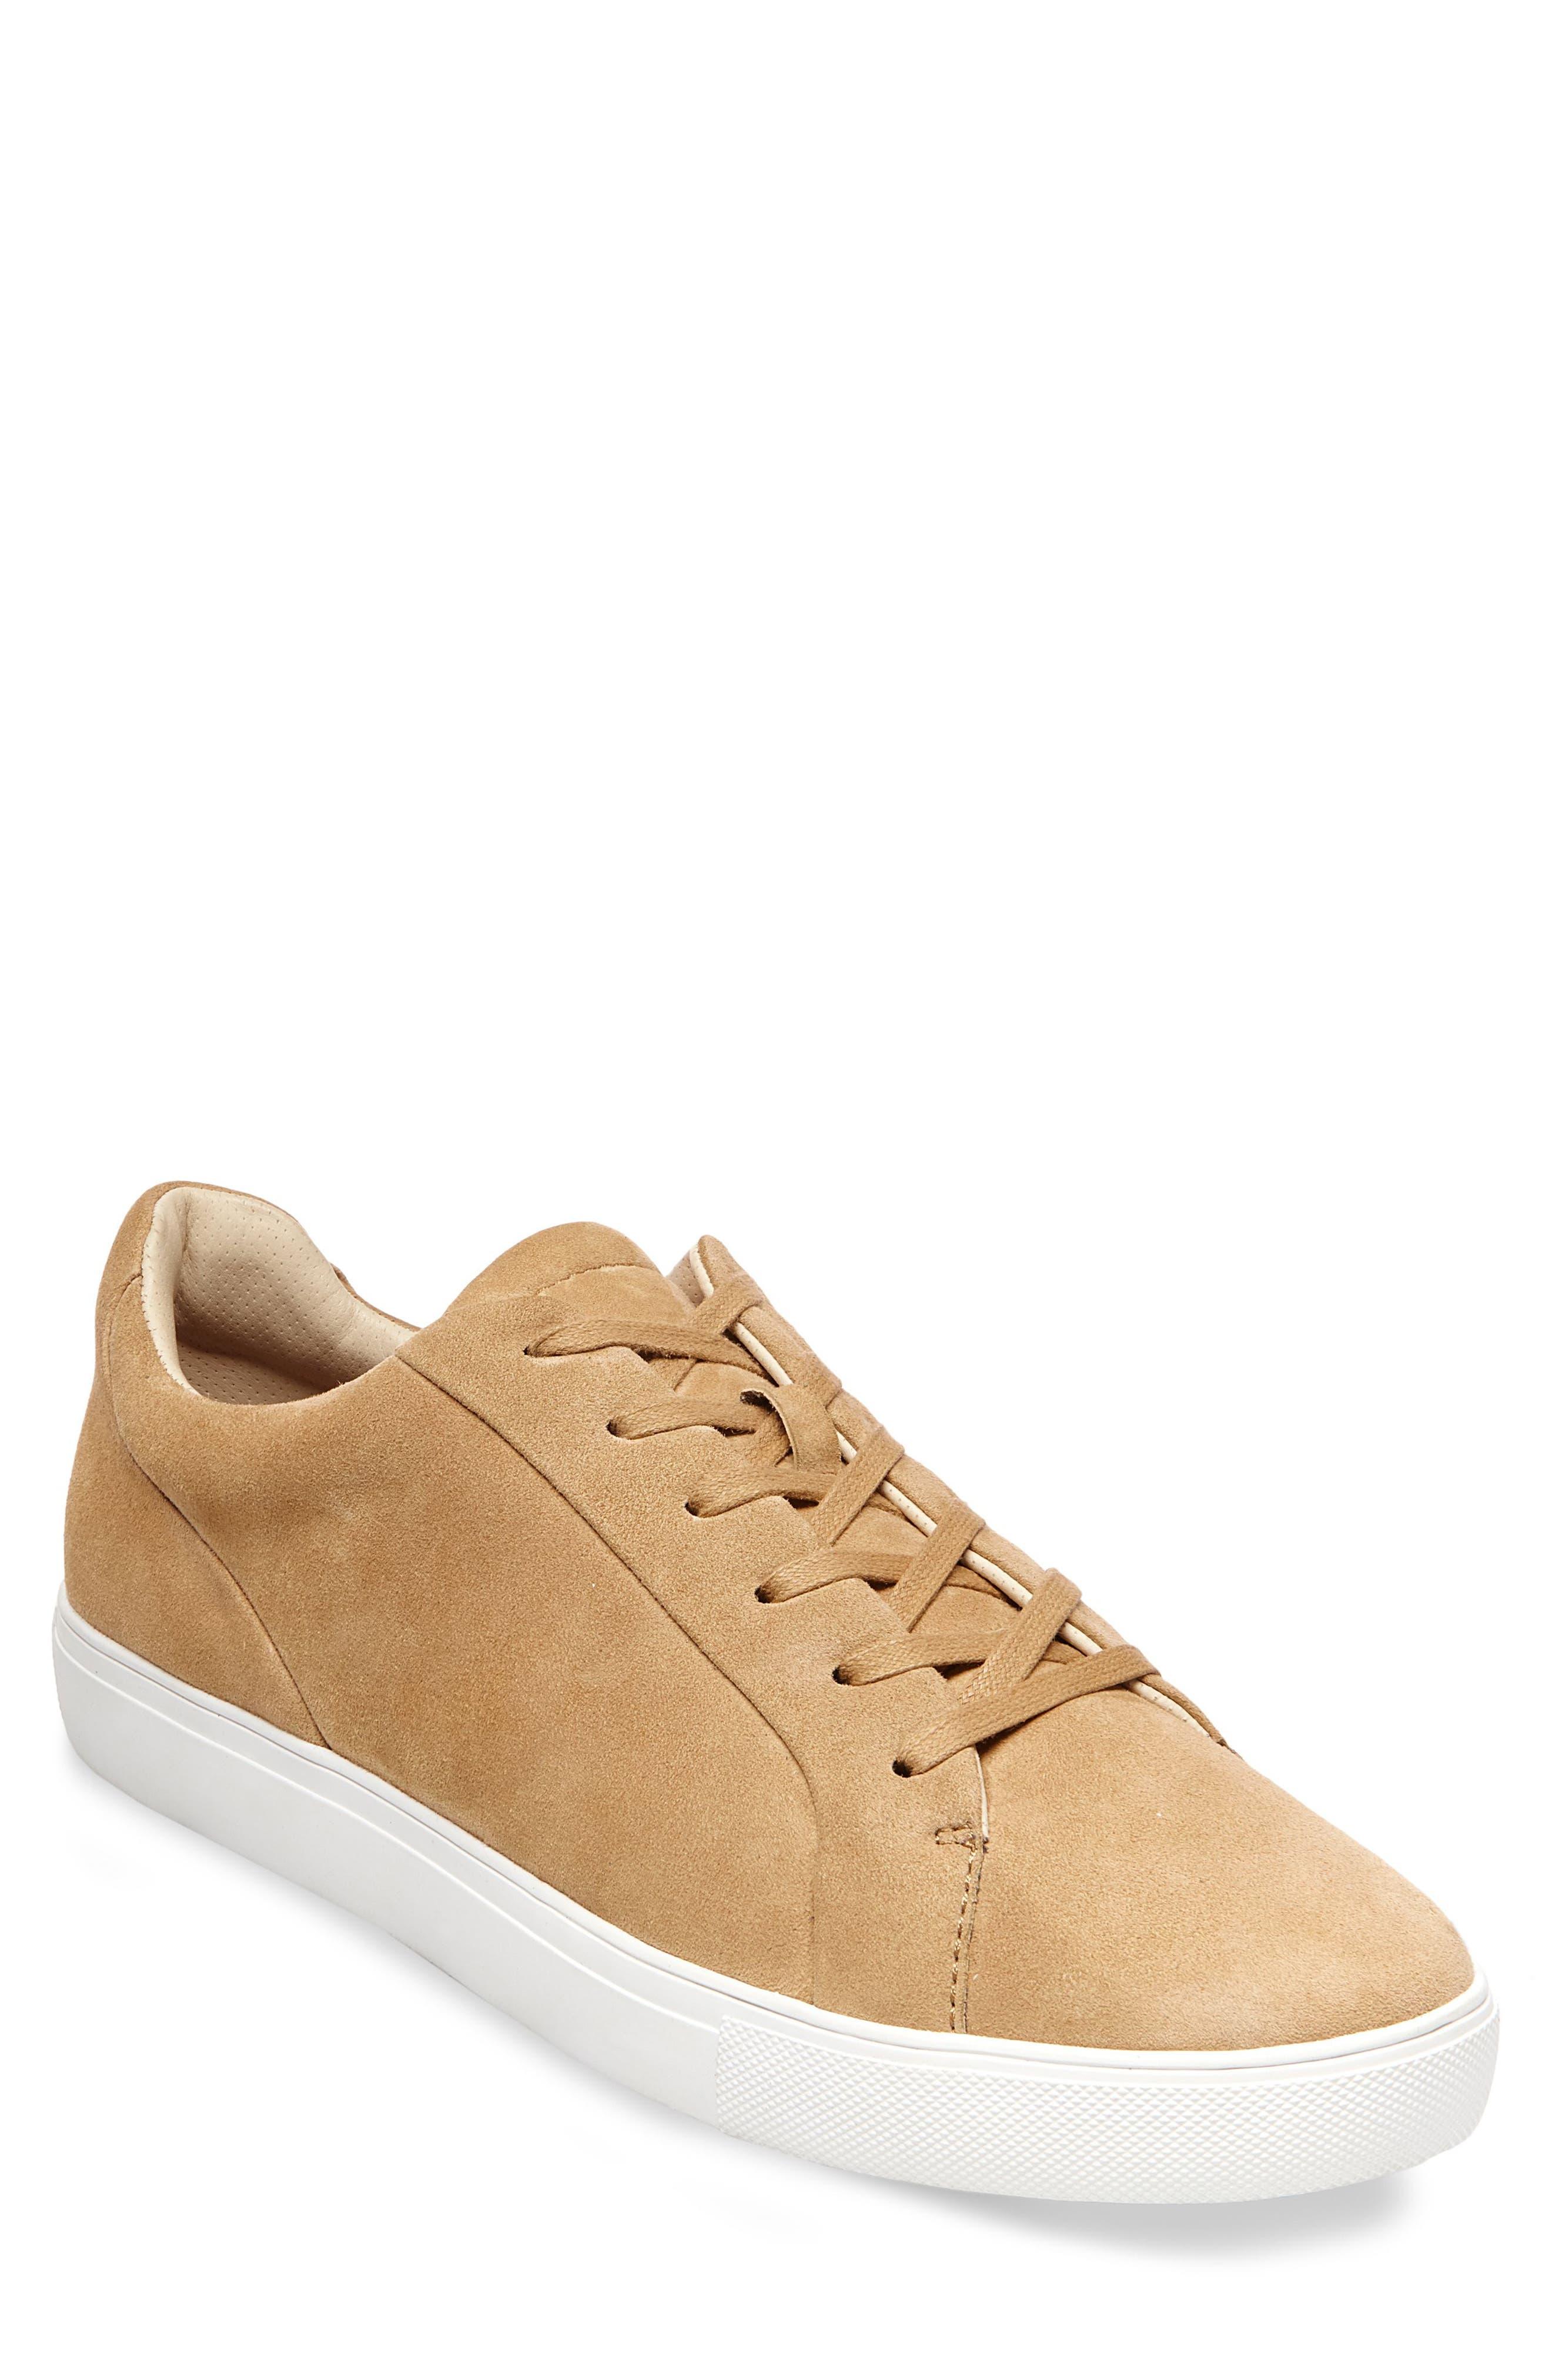 x GQ James Sneaker,                             Main thumbnail 2, color,